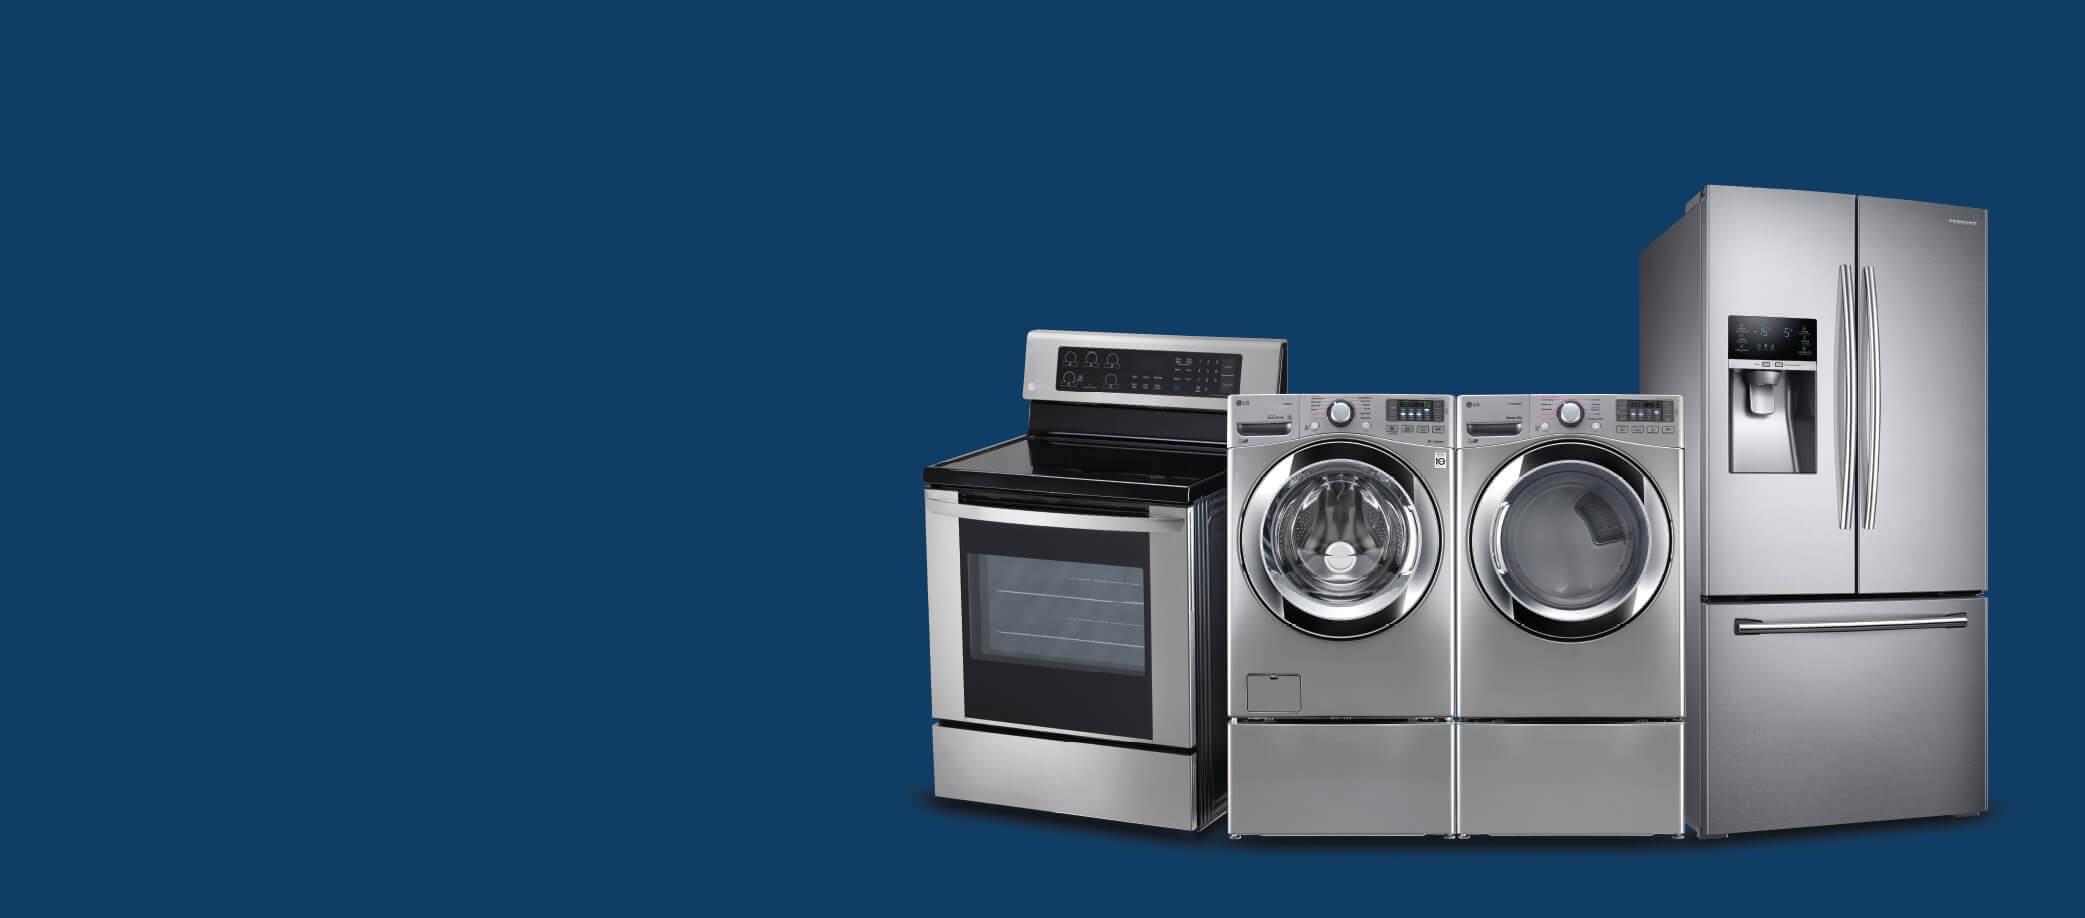 Does best buy hook up appliances #14